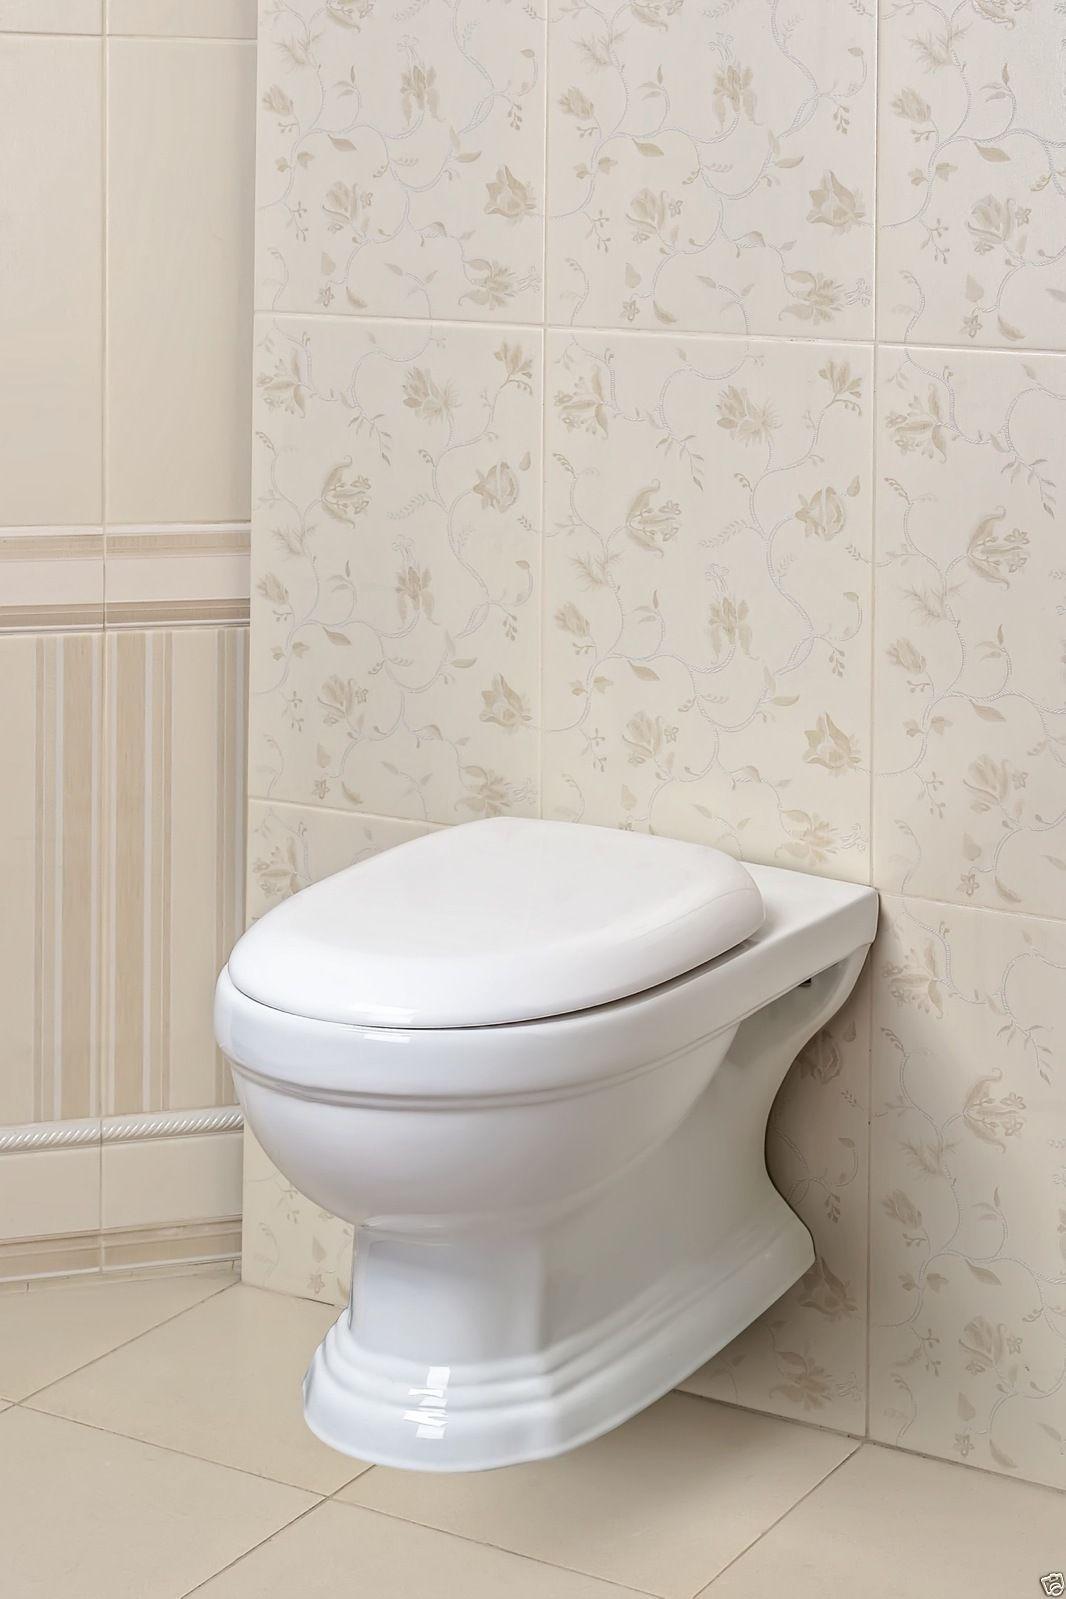 design wand h nge wc keramik wc retro classic toilette softclose kr13 kr16 kaufen bei milkando. Black Bedroom Furniture Sets. Home Design Ideas